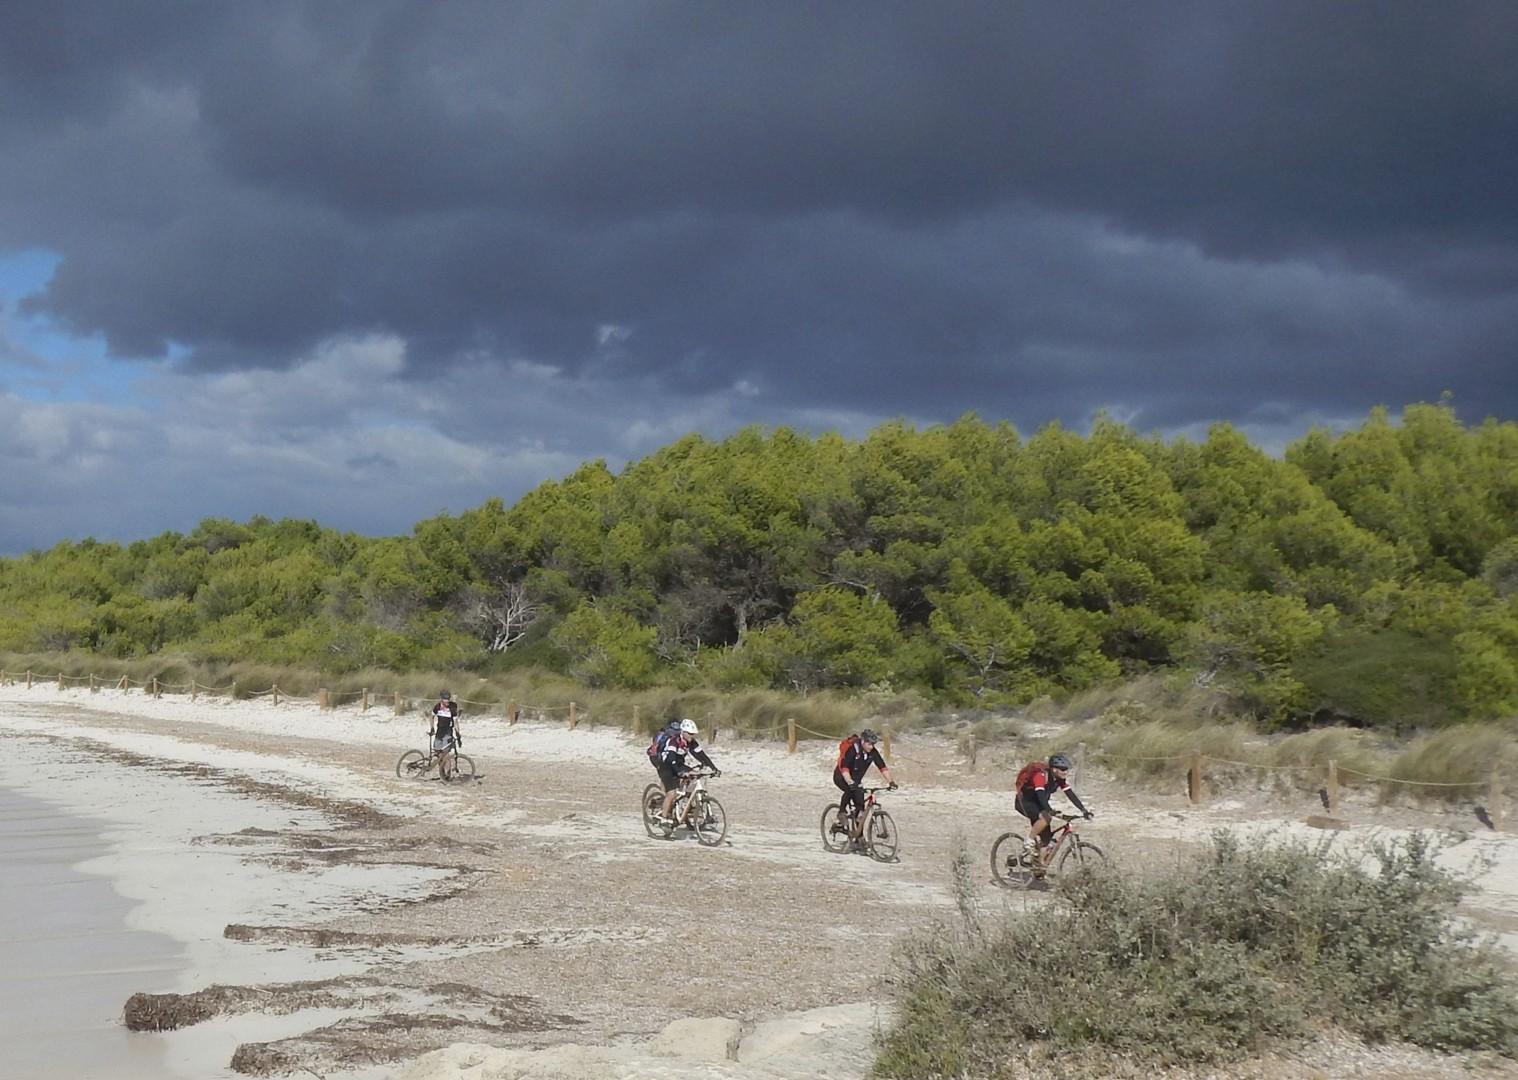 mountain-biking-holiday-spain-beach.jpg - Spain - Menorca - Cami de Cavalls - Guided Mountain Bike Holiday - Mountain Biking